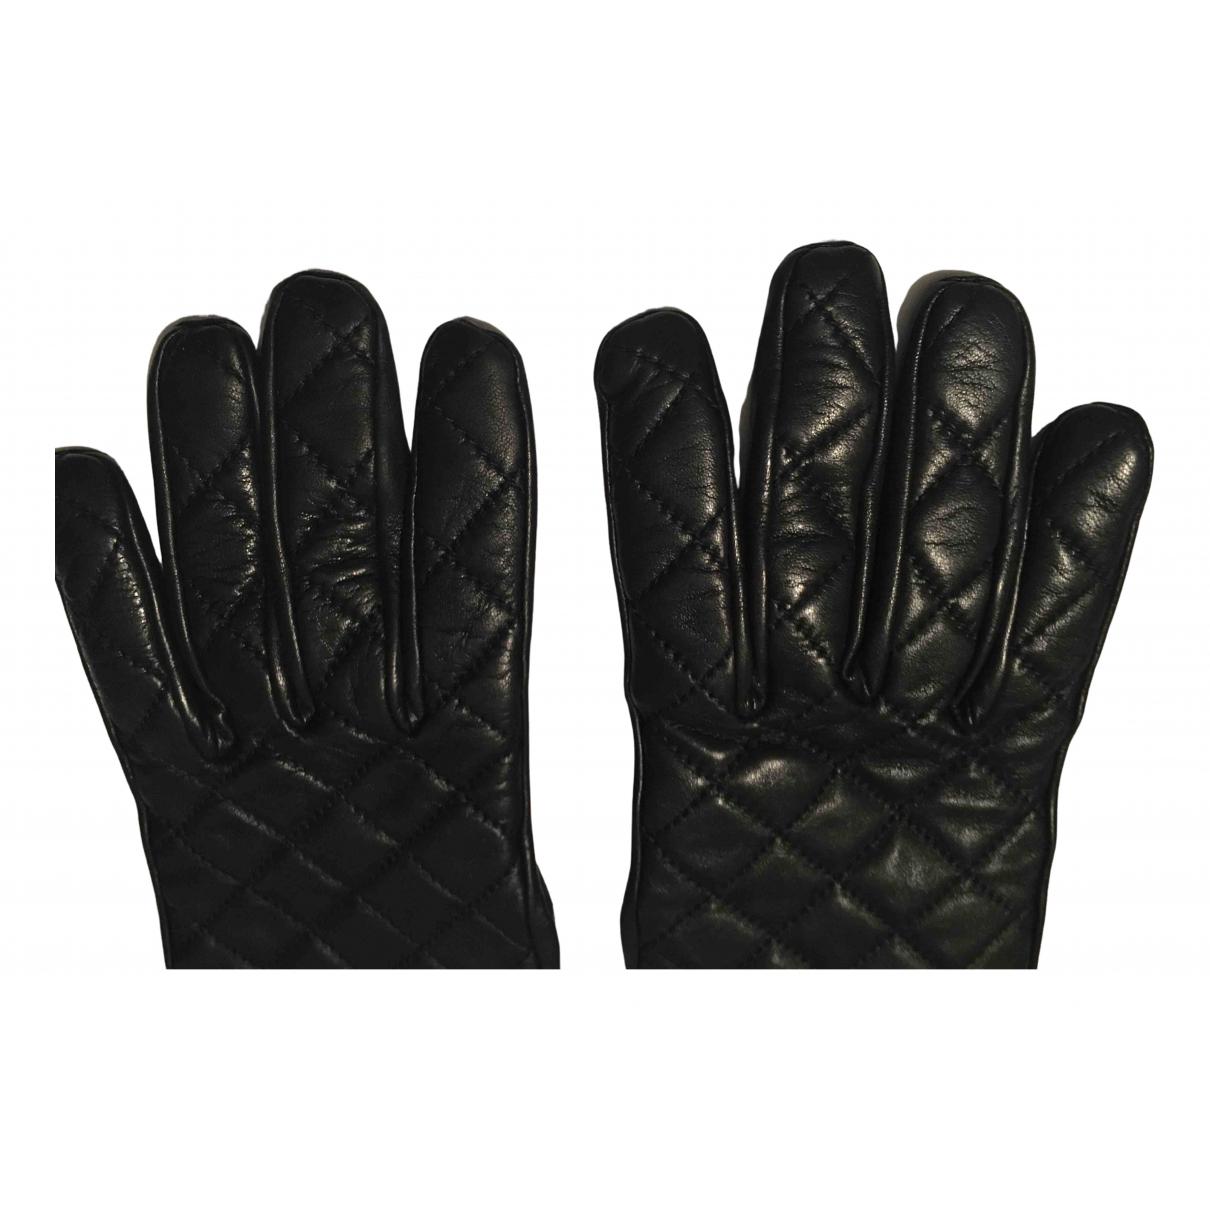 Chanel \N Black Leather Gloves for Women M International